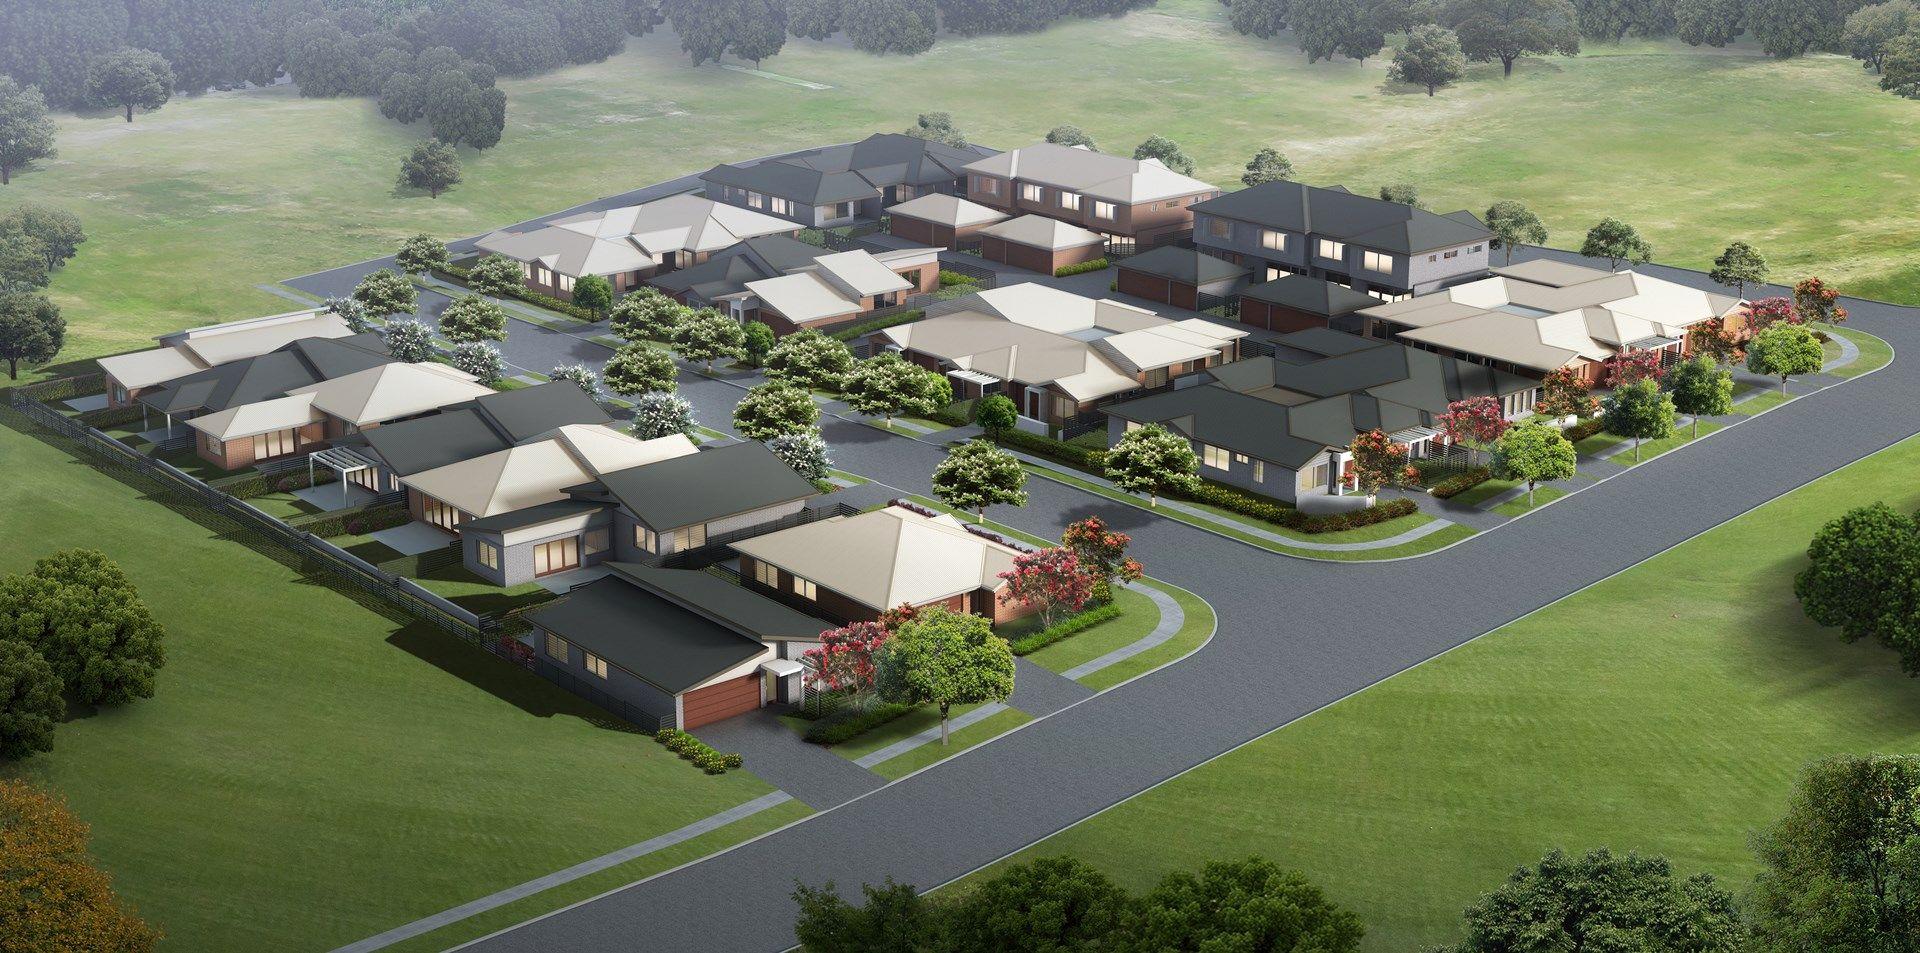 1 25  7 stockton st  morisset nsw 2264 3 beds house for